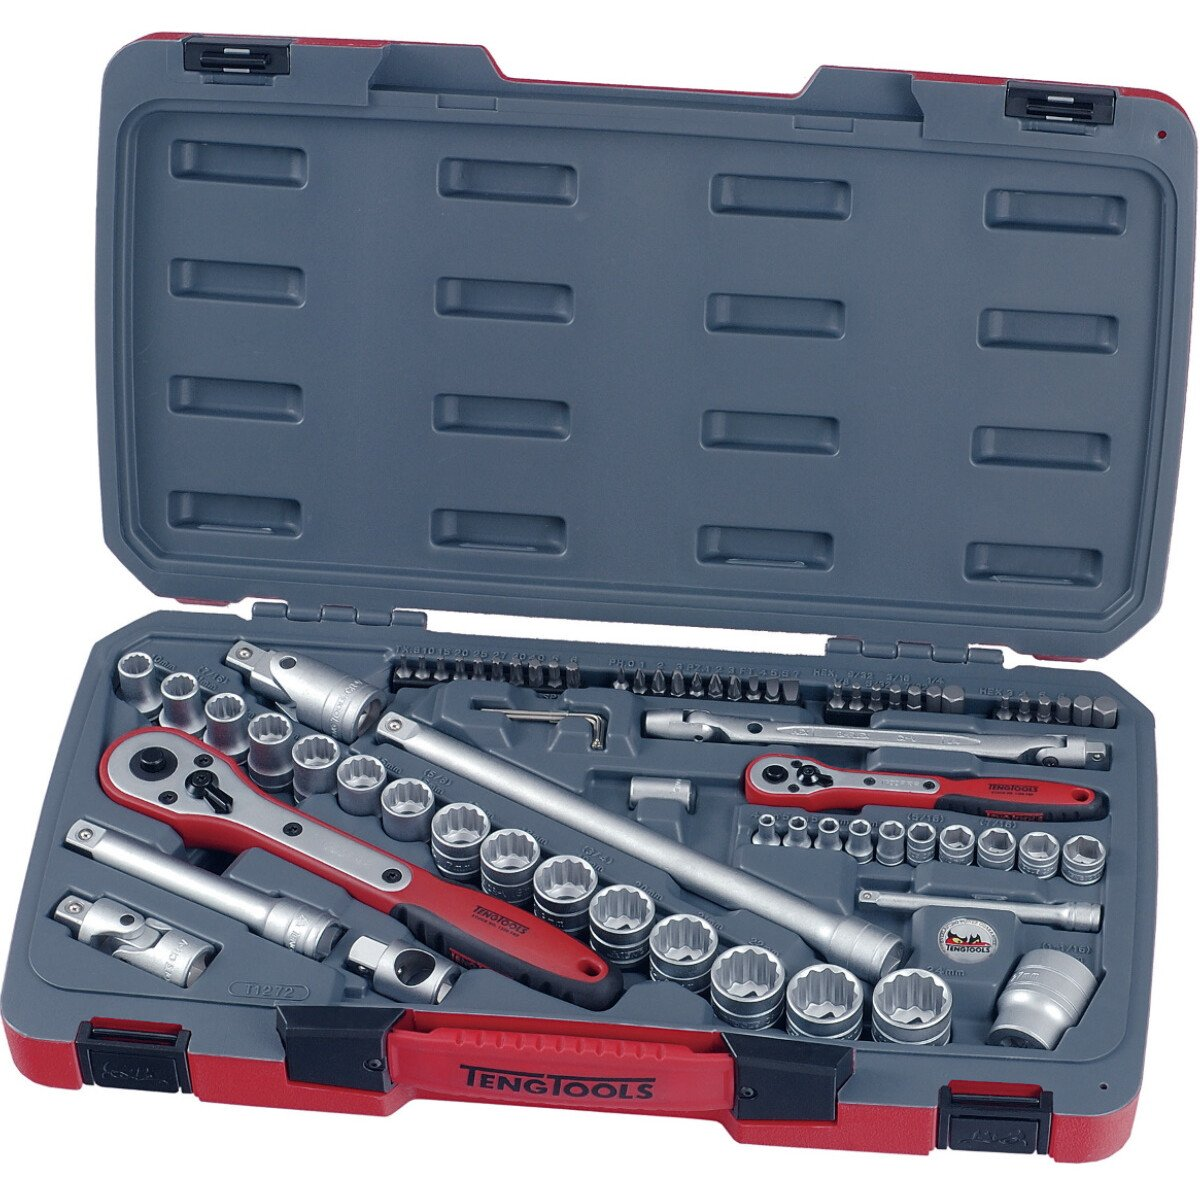 "Teng Tools T1272 72 Piece 1/4"" and 1/2"" Drive Metric Socket Set"